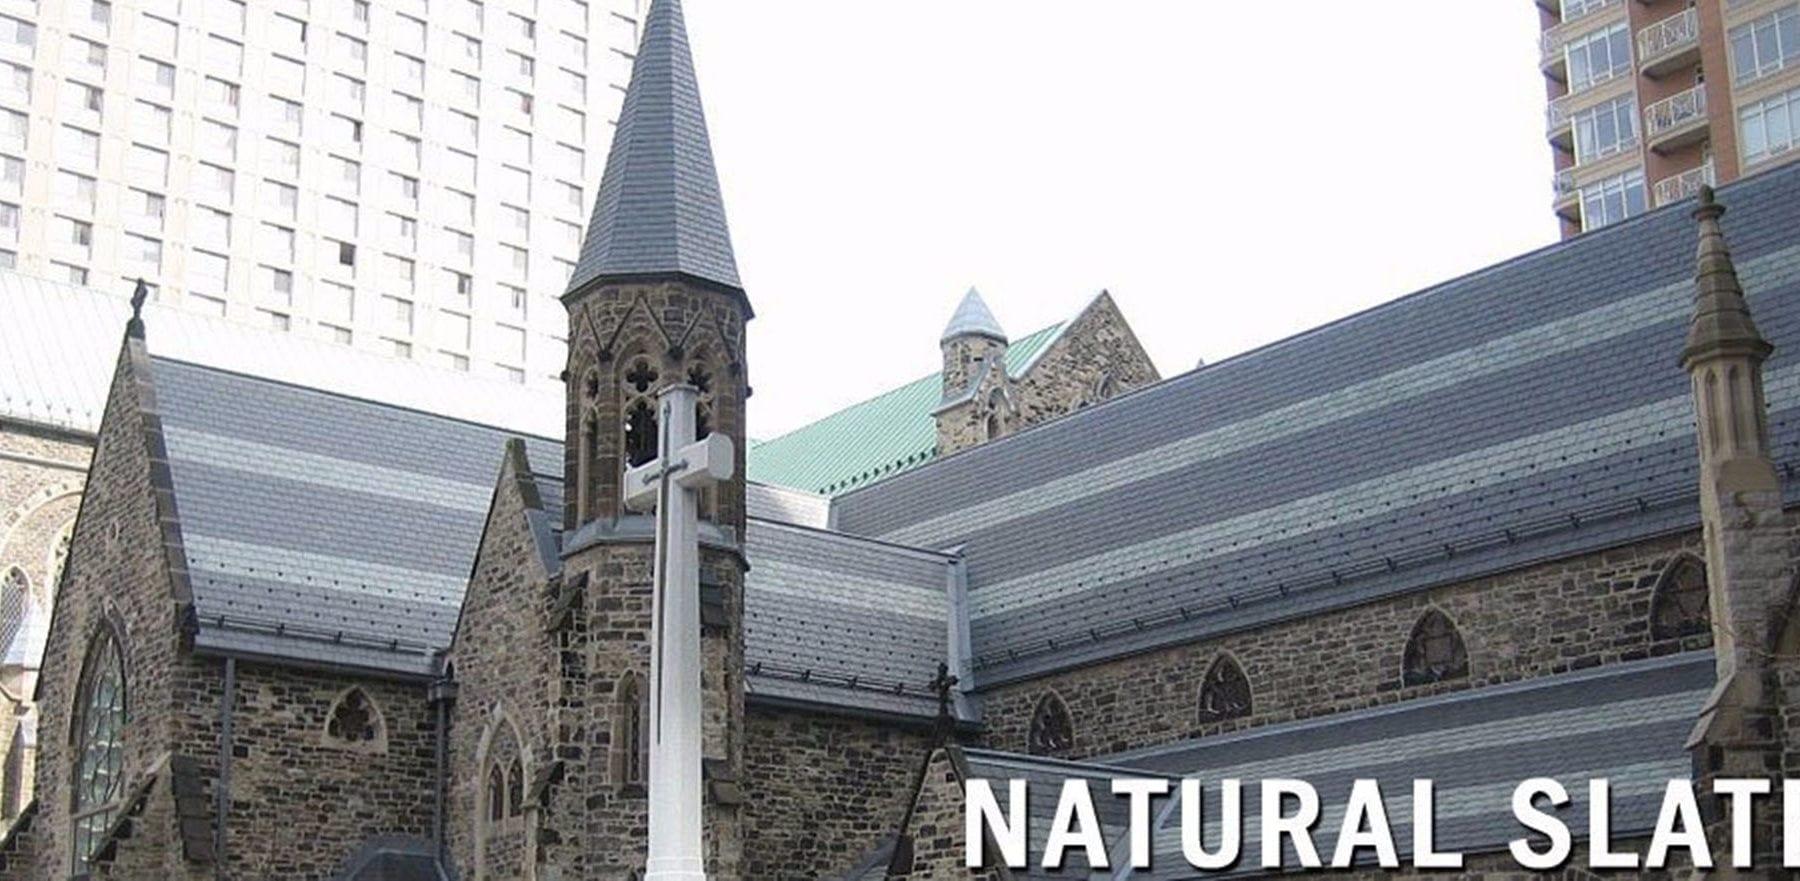 Lifestiles - Canadian Natural Slate Roof Tiles - Various, England 6